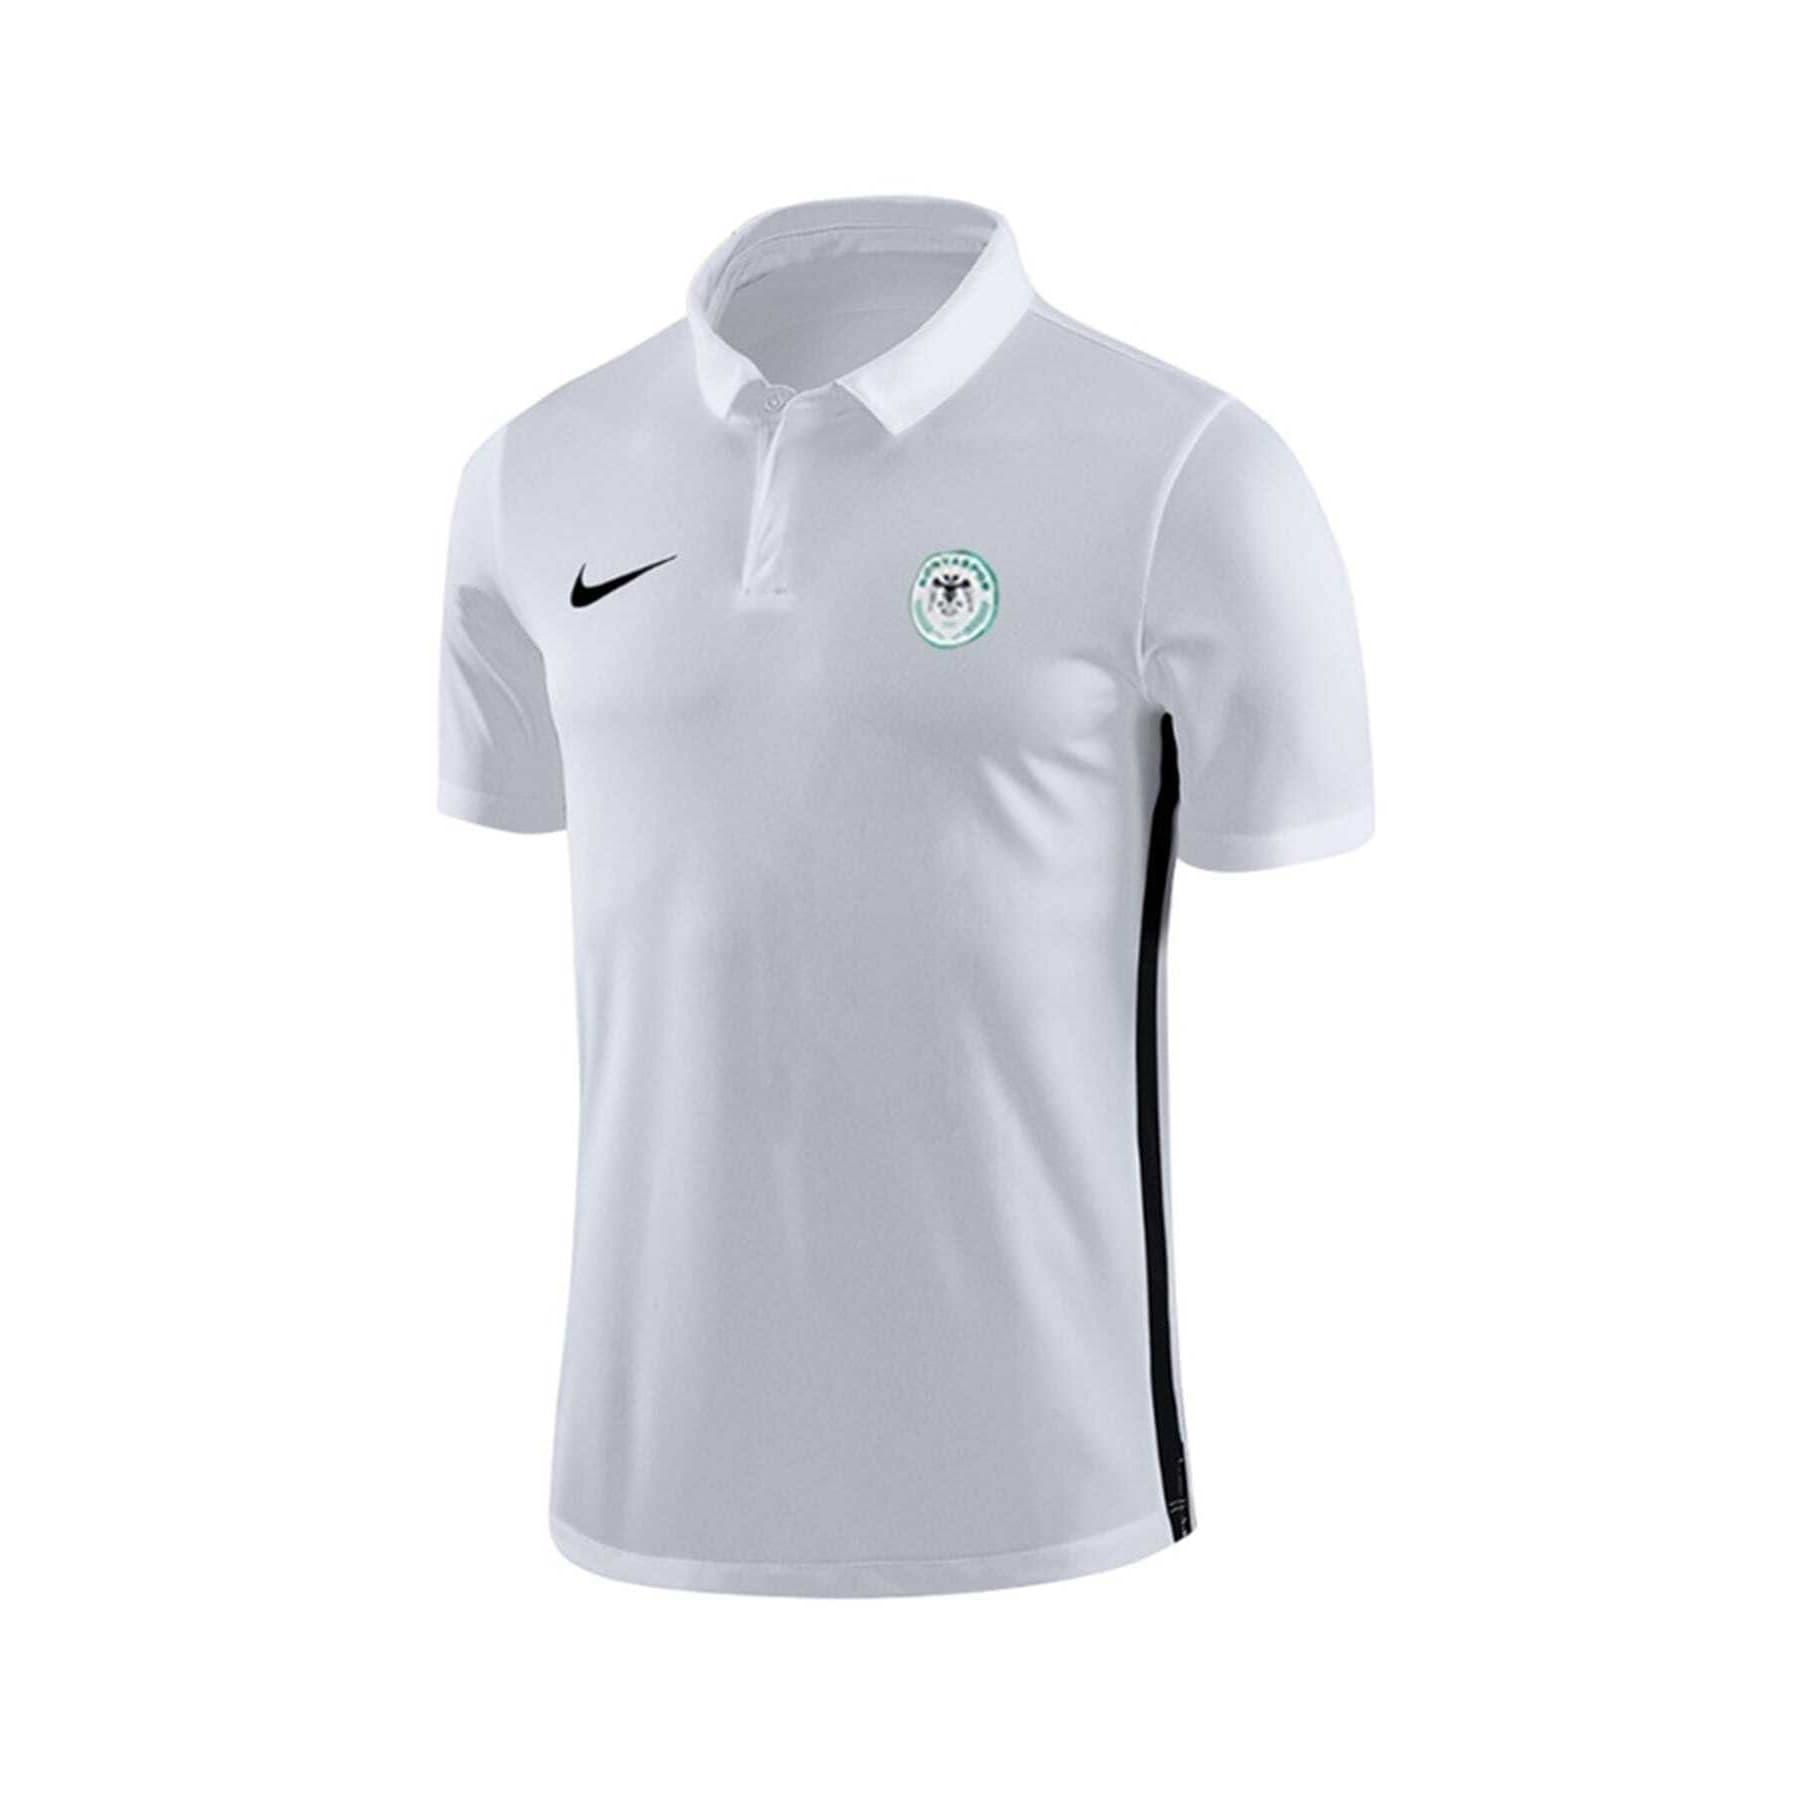 Dri-Fit Academy 18 Erkek Beyaz Polo Tişört (899984-100)